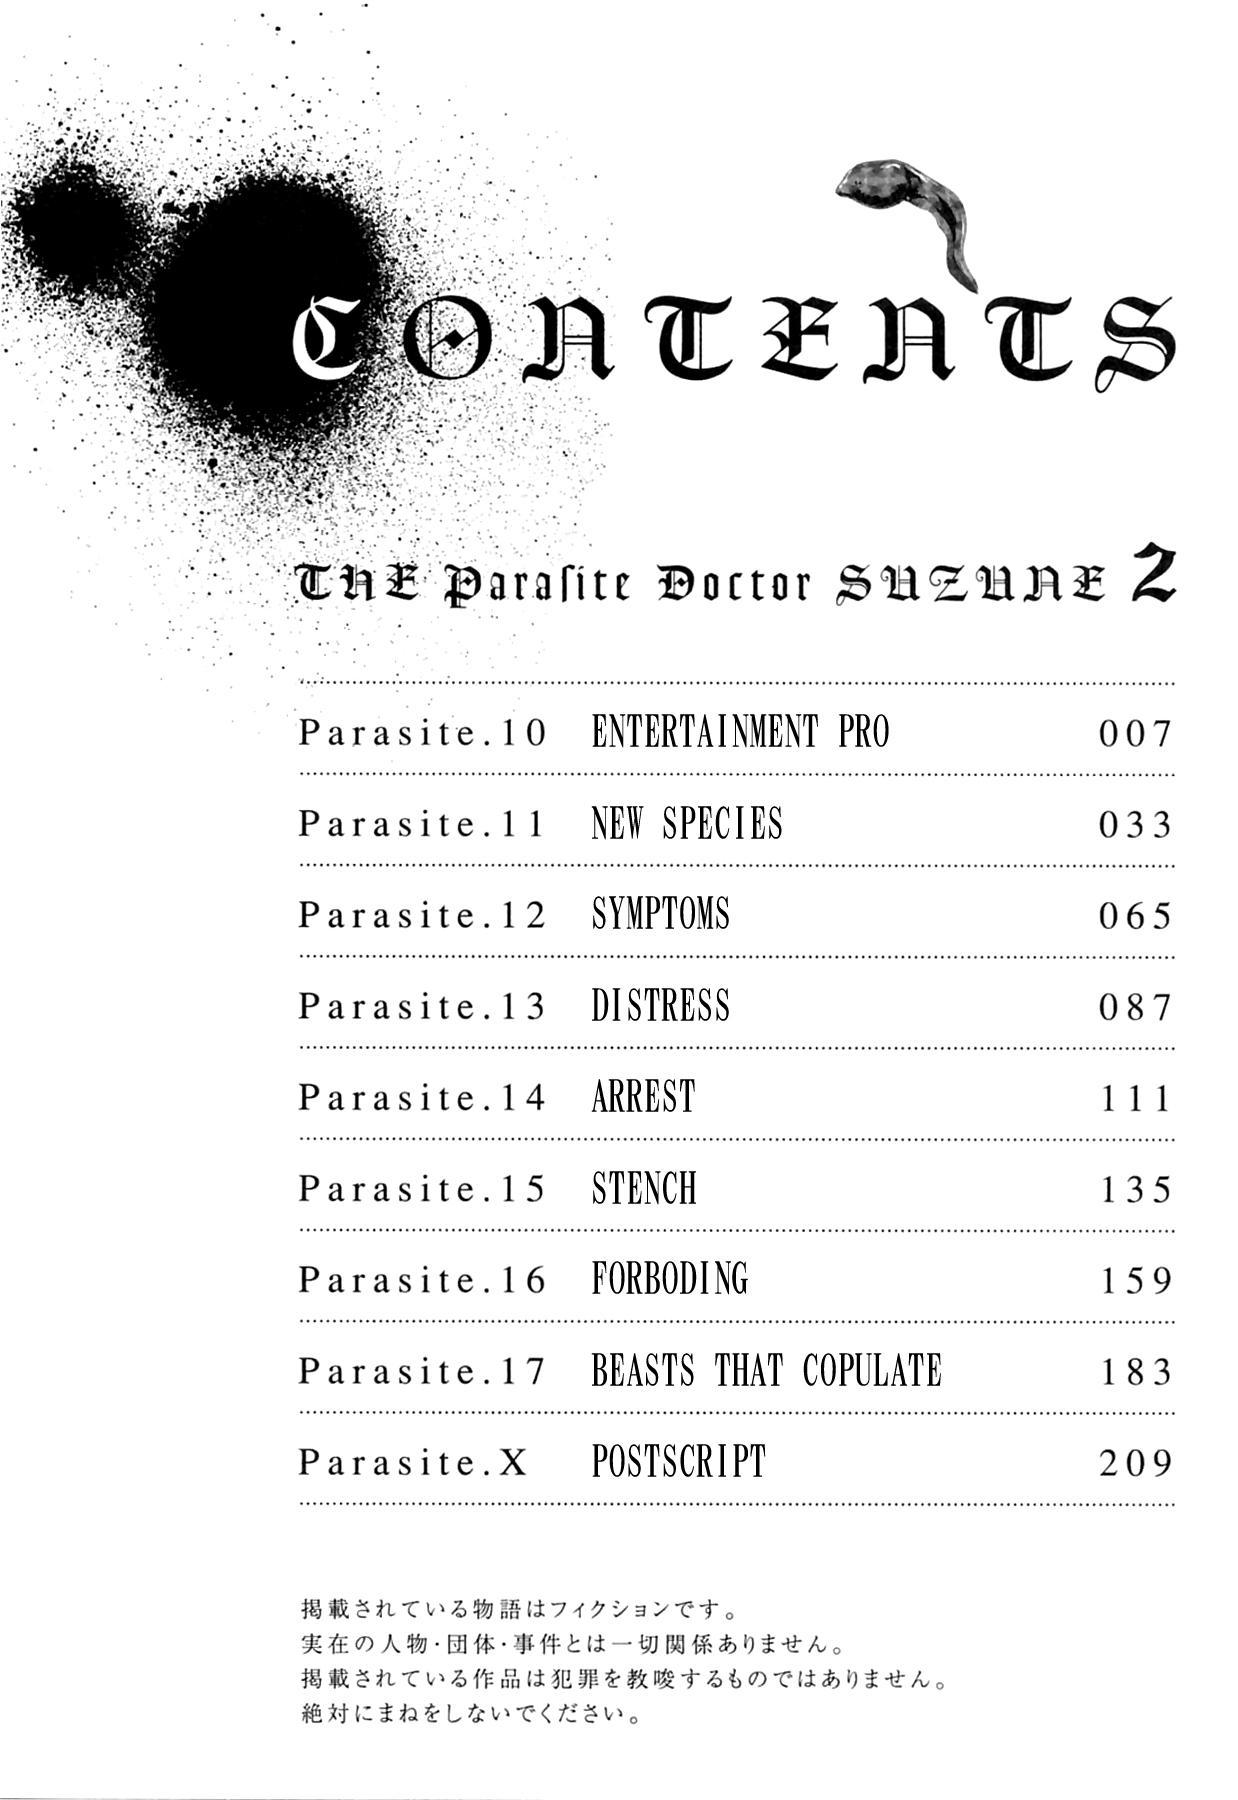 [Haruki] Kisei Juui Suzune (Parasite Doctor Suzune) Vol.02 - CH10-11 5